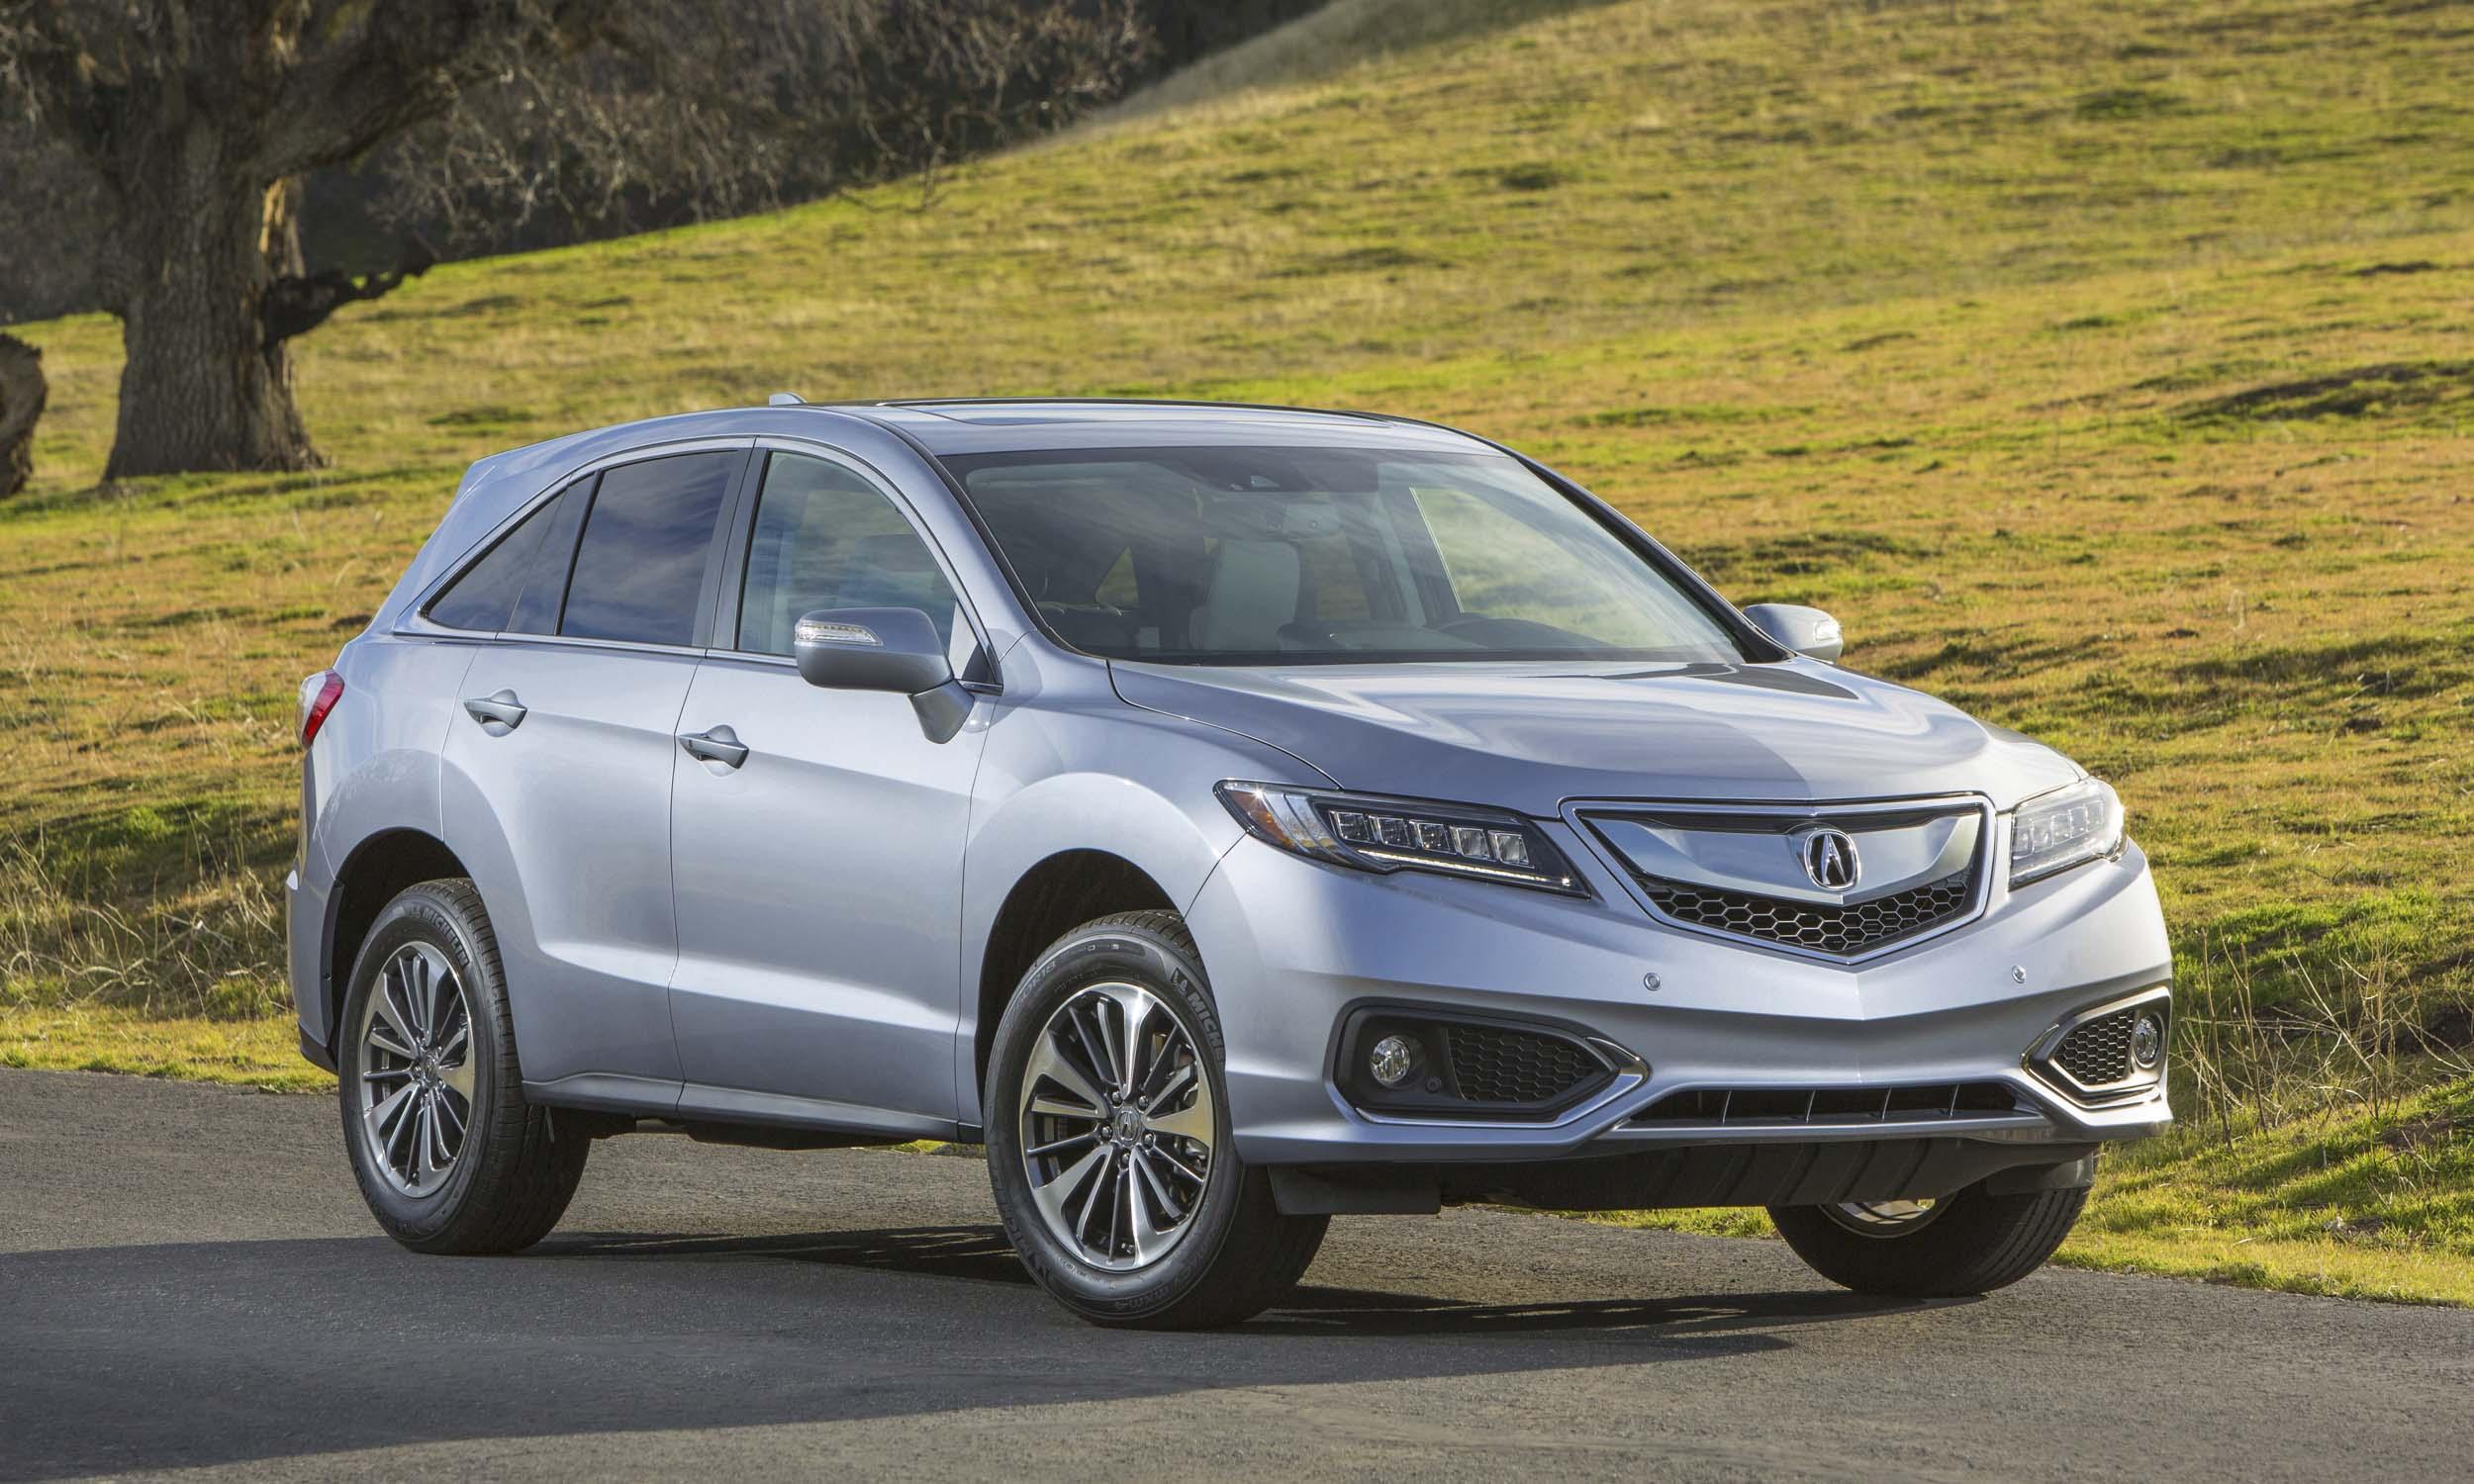 © American Honda Motor Co., Inc.